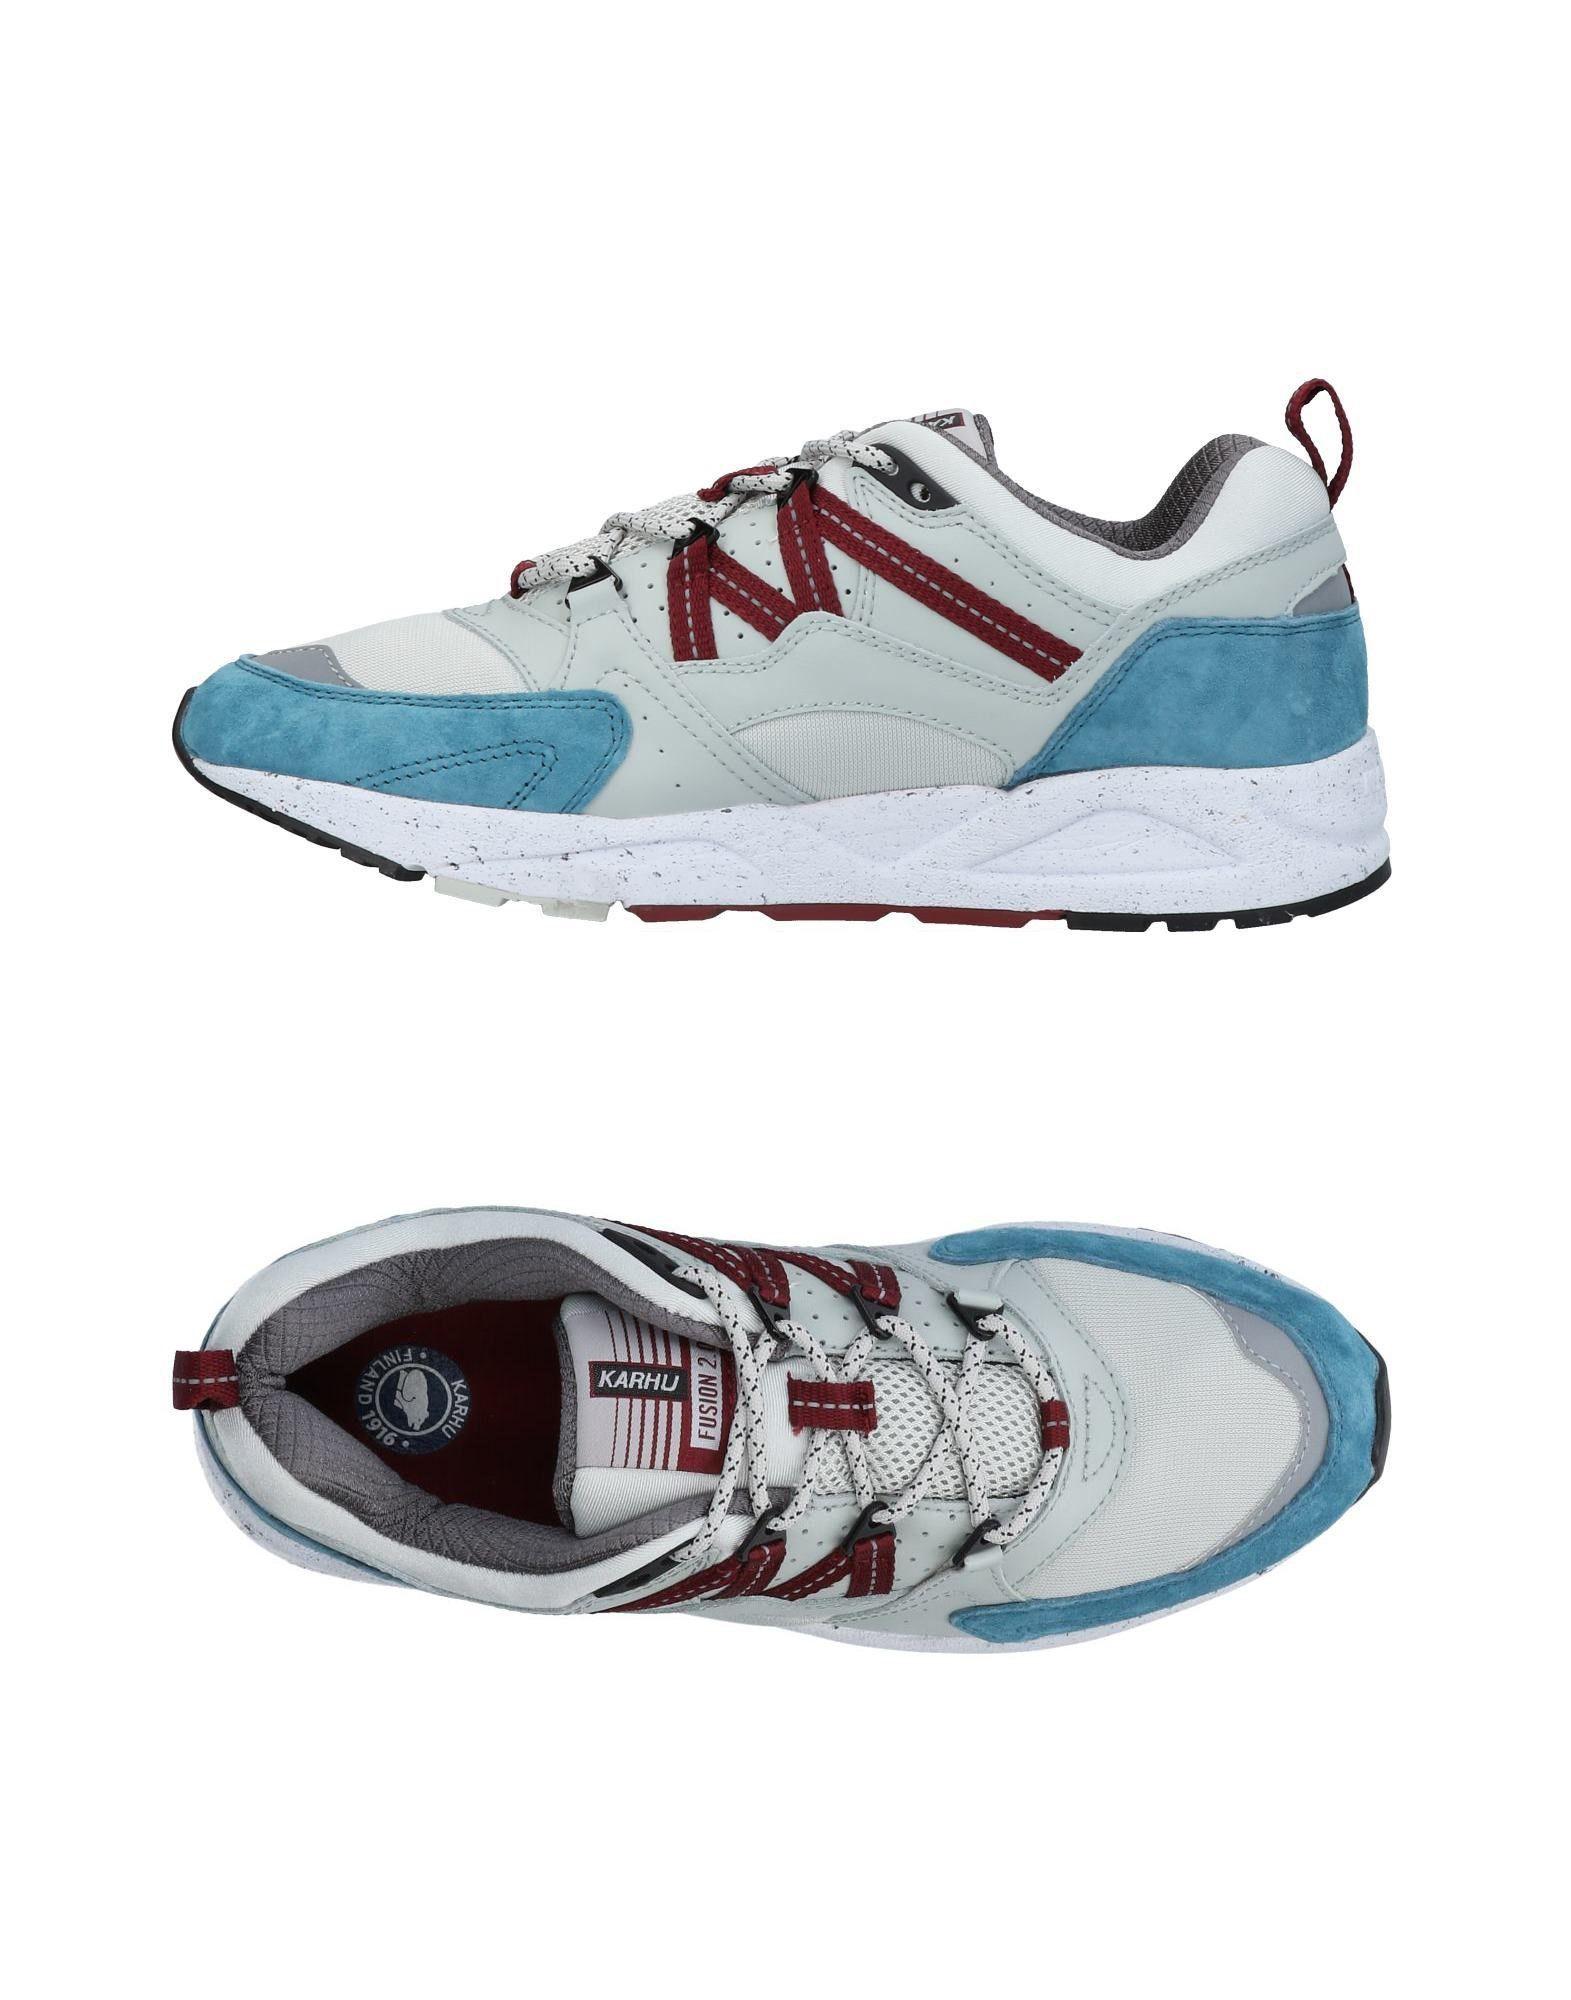 Moda Sneakers Karhu Karhu Sneakers Uomo - 11452908RK 24f4b3